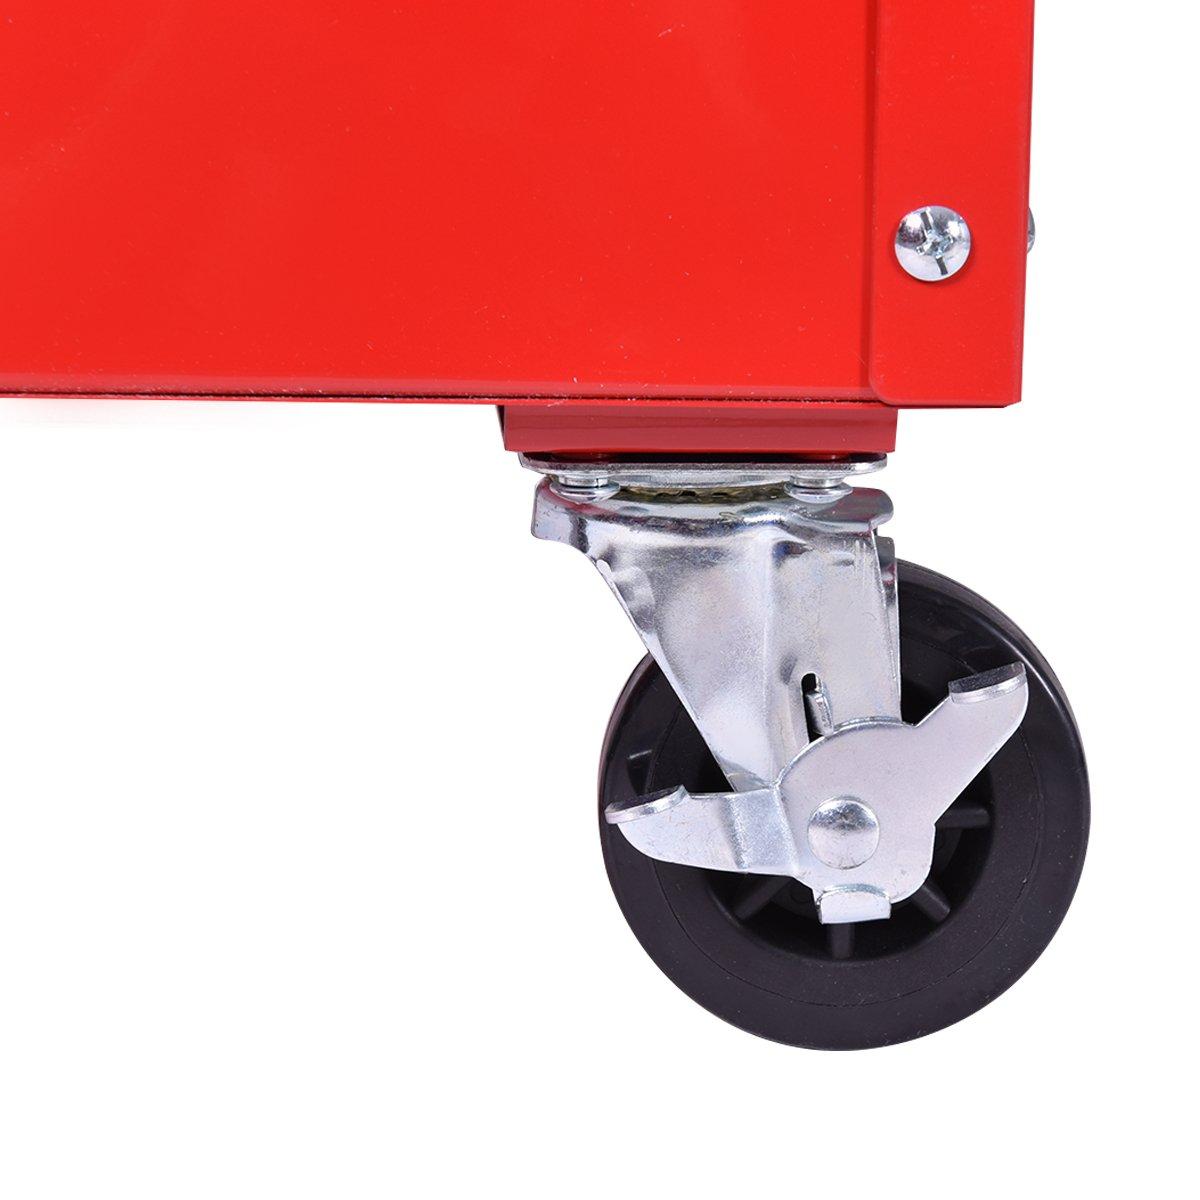 Goplus Tool Cart Rolling 36-Inch Steel Tool Chest Box Wheels Trays w/ Locking Drawer, Red by Goplus (Image #7)